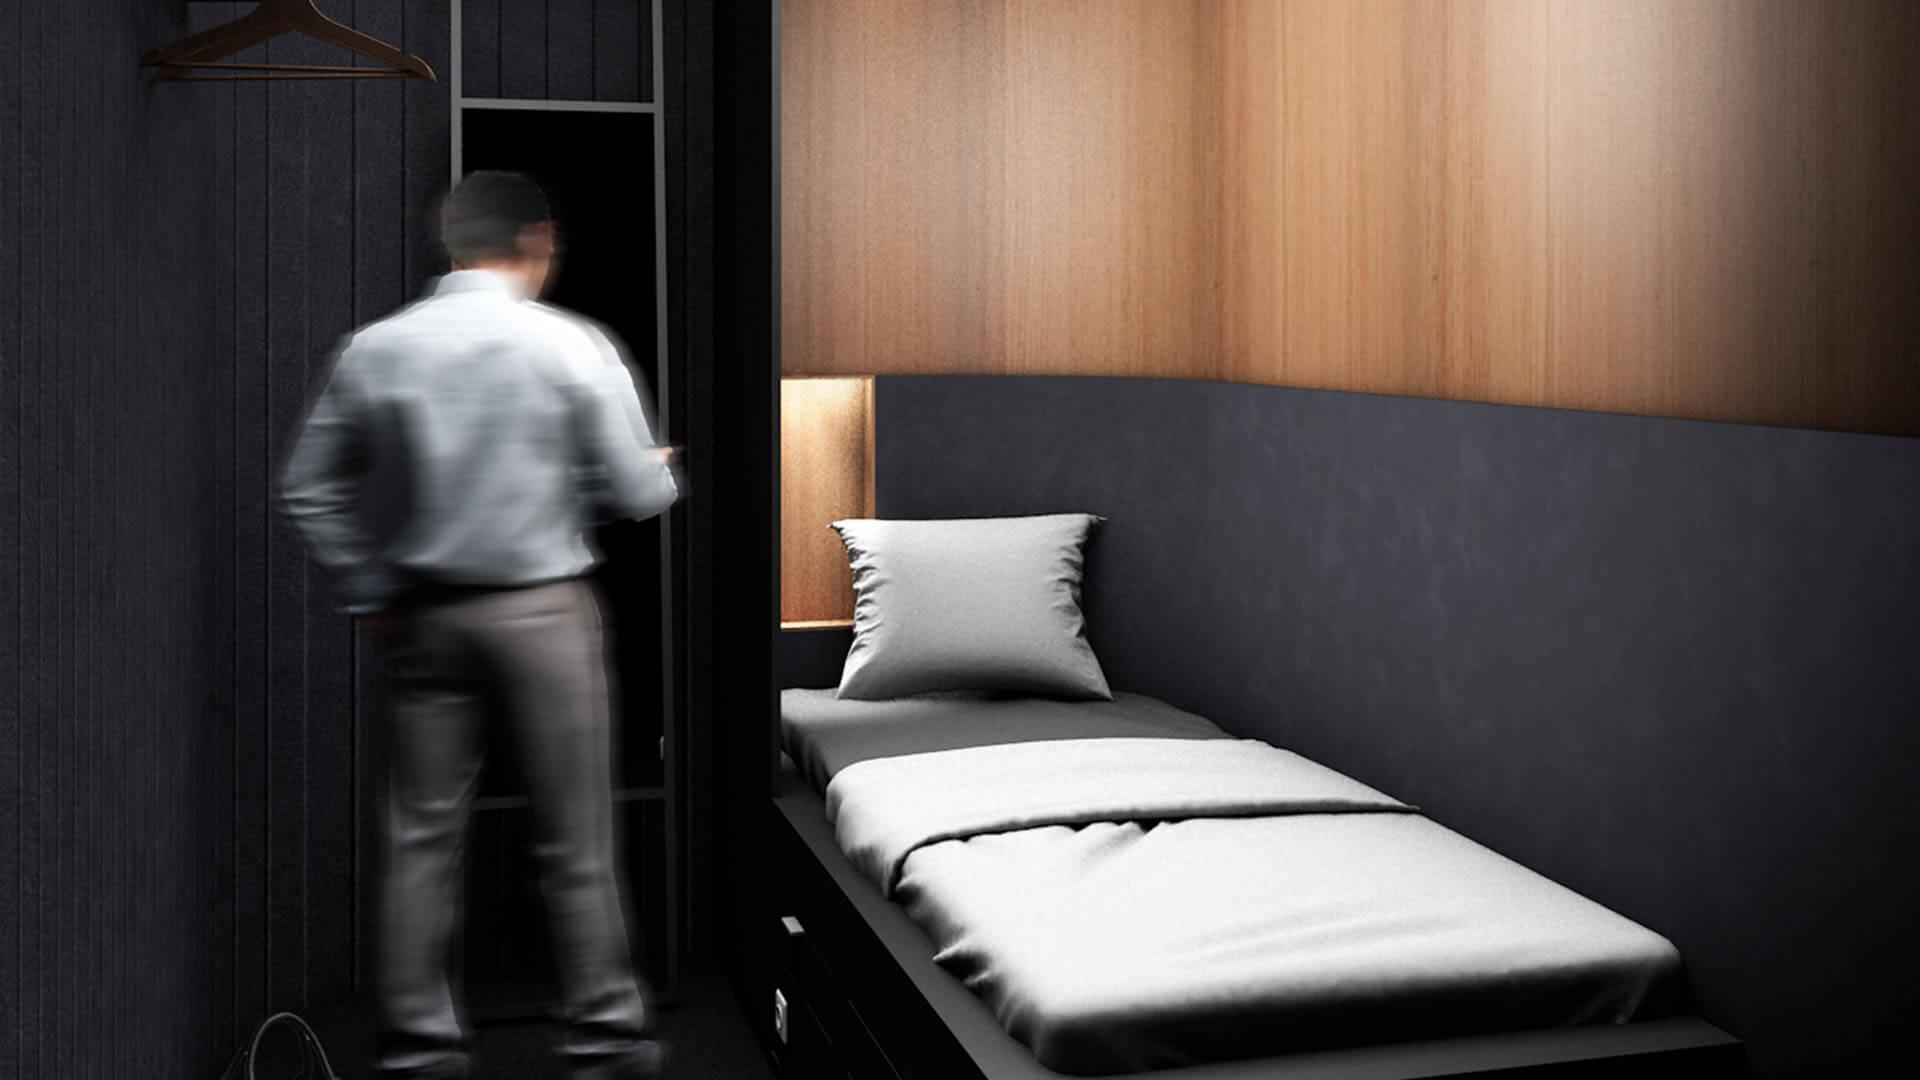 11 sleeping room hotspot